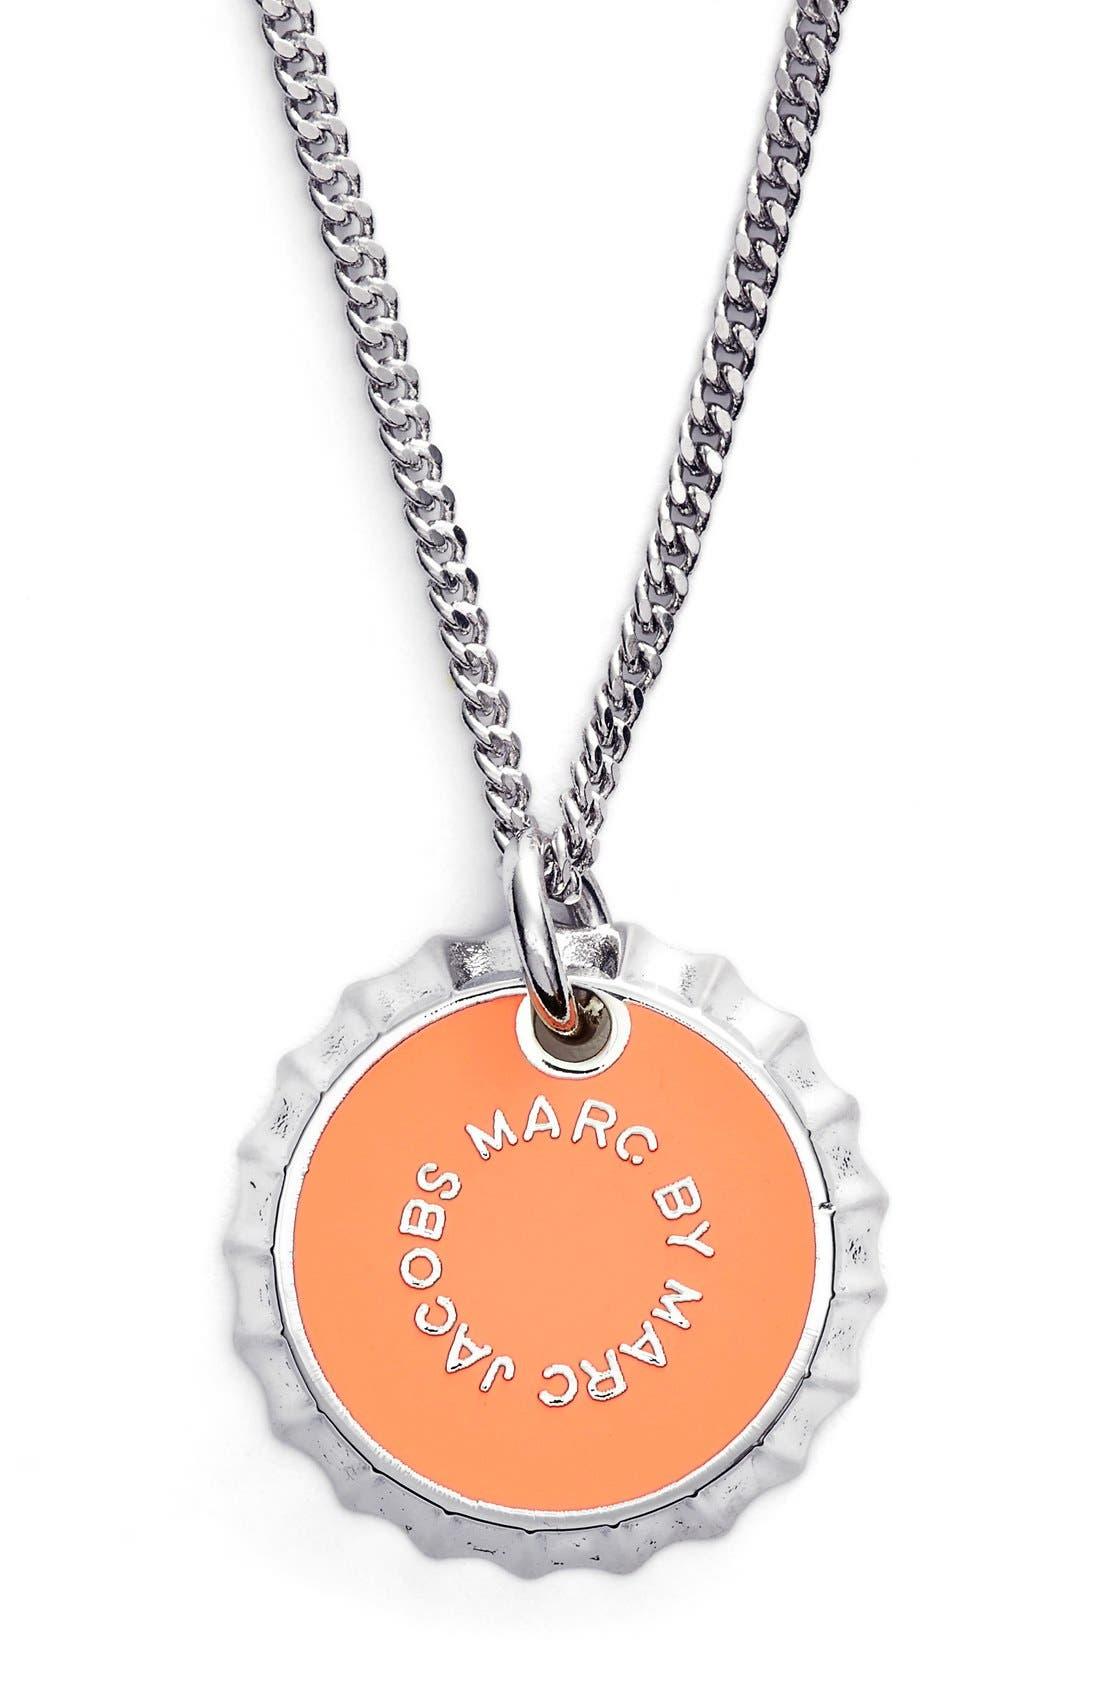 Main Image - MARC BY MARC JACOBS 'Lost & Found' Bottle Cap Pendant Necklace